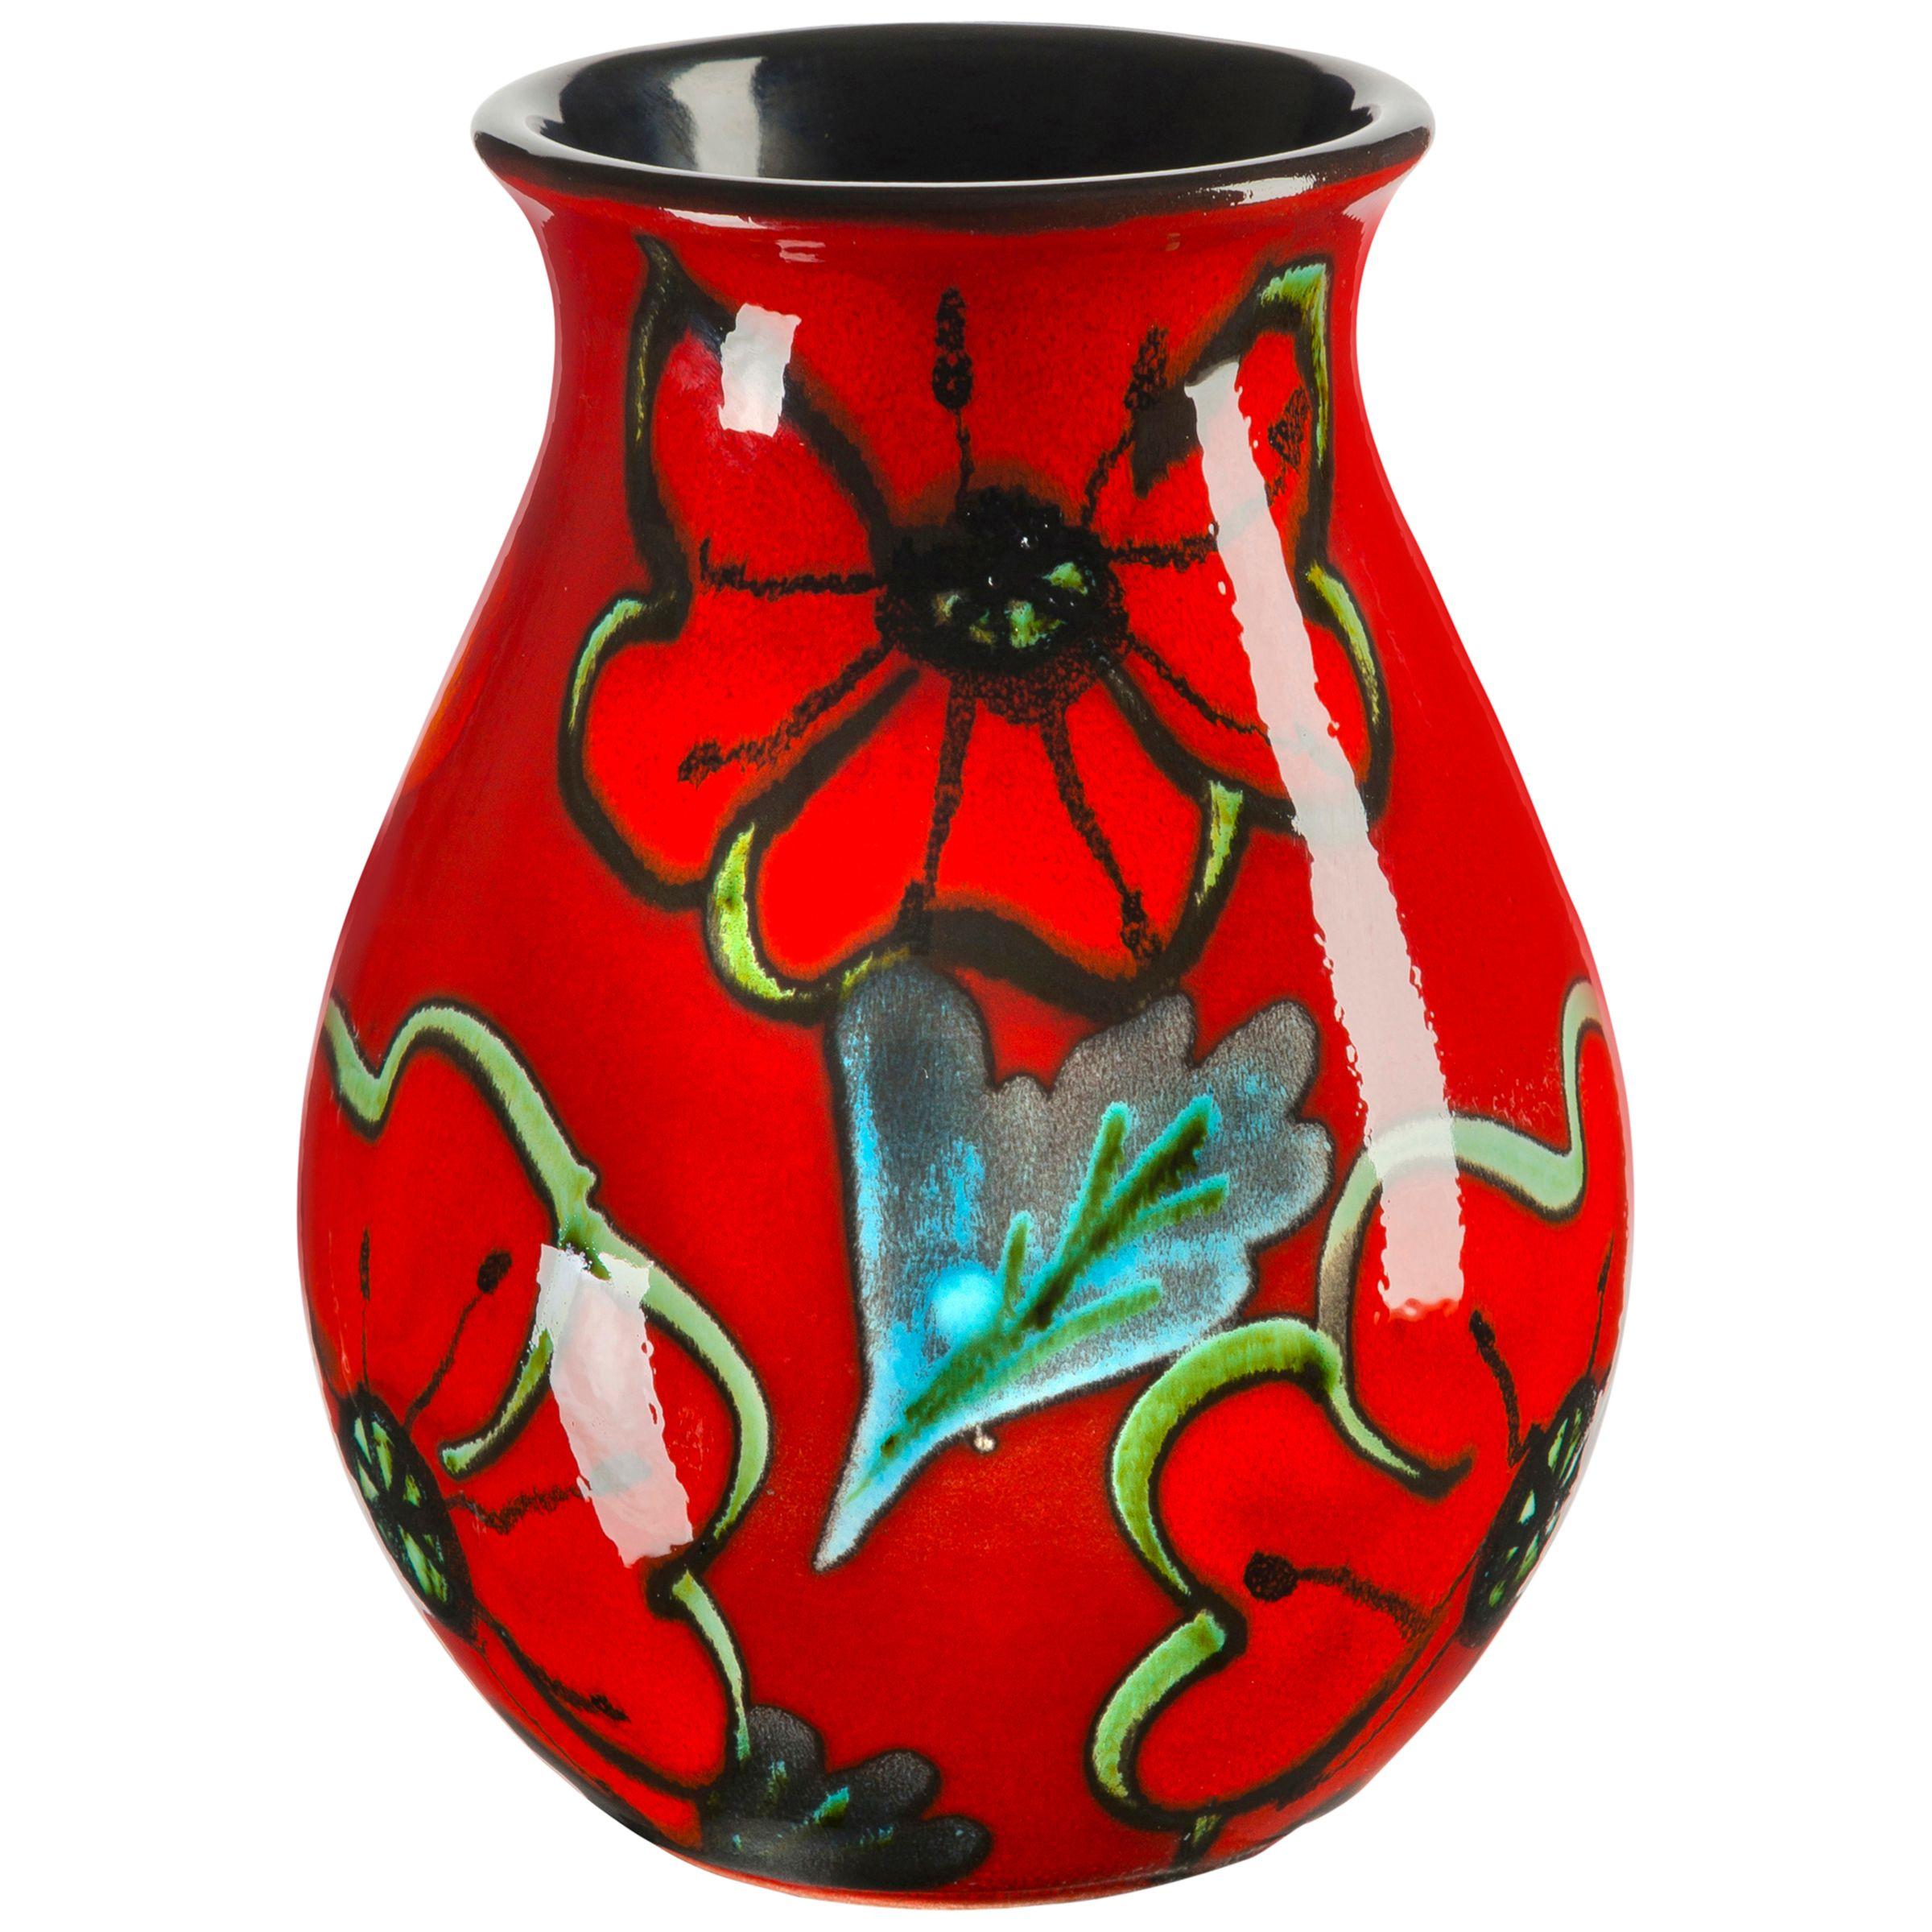 Poole Pottery Poole Pottery Poppyfield Venetian Posy Vase